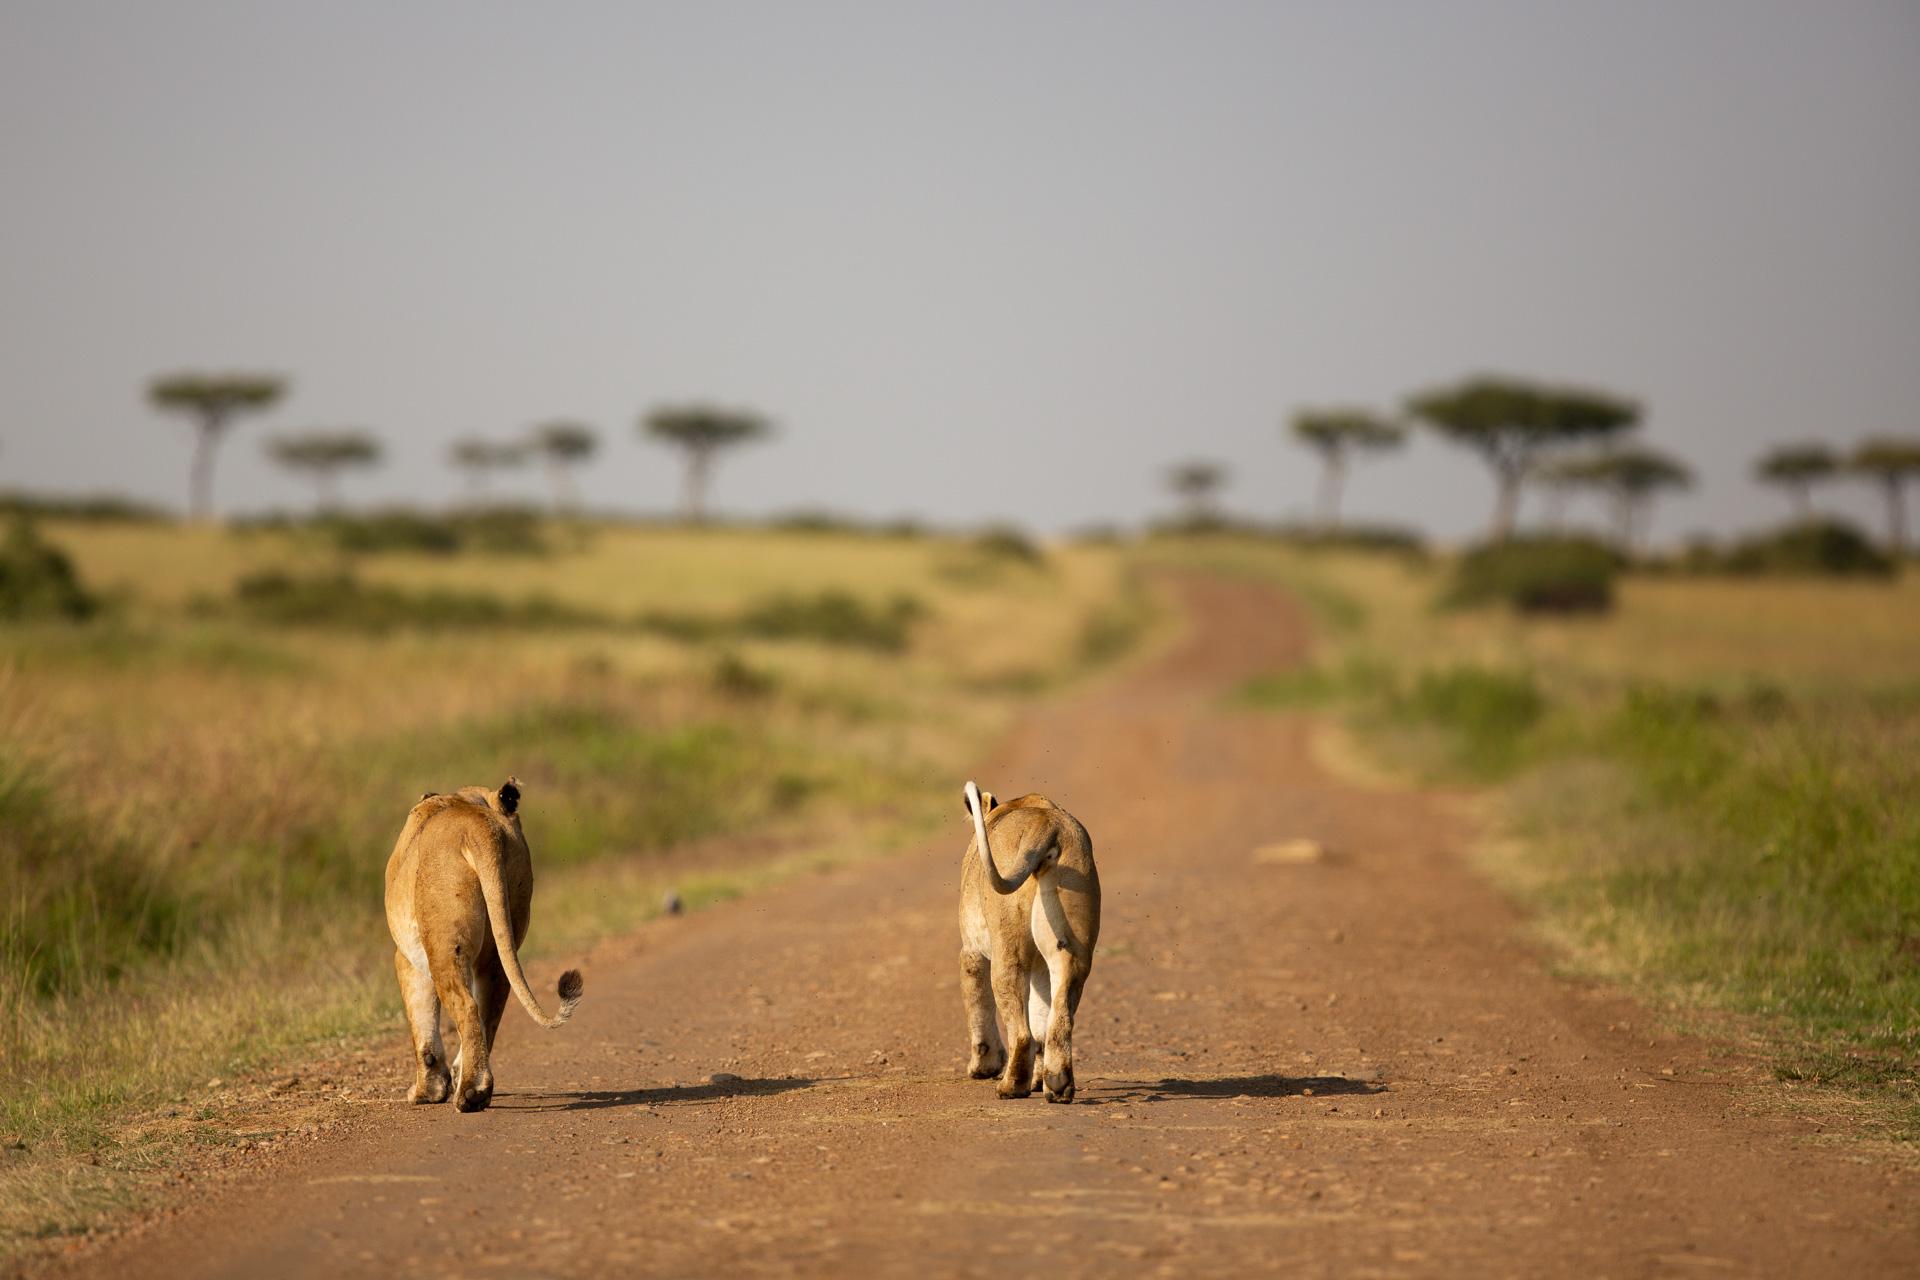 lions walking down road